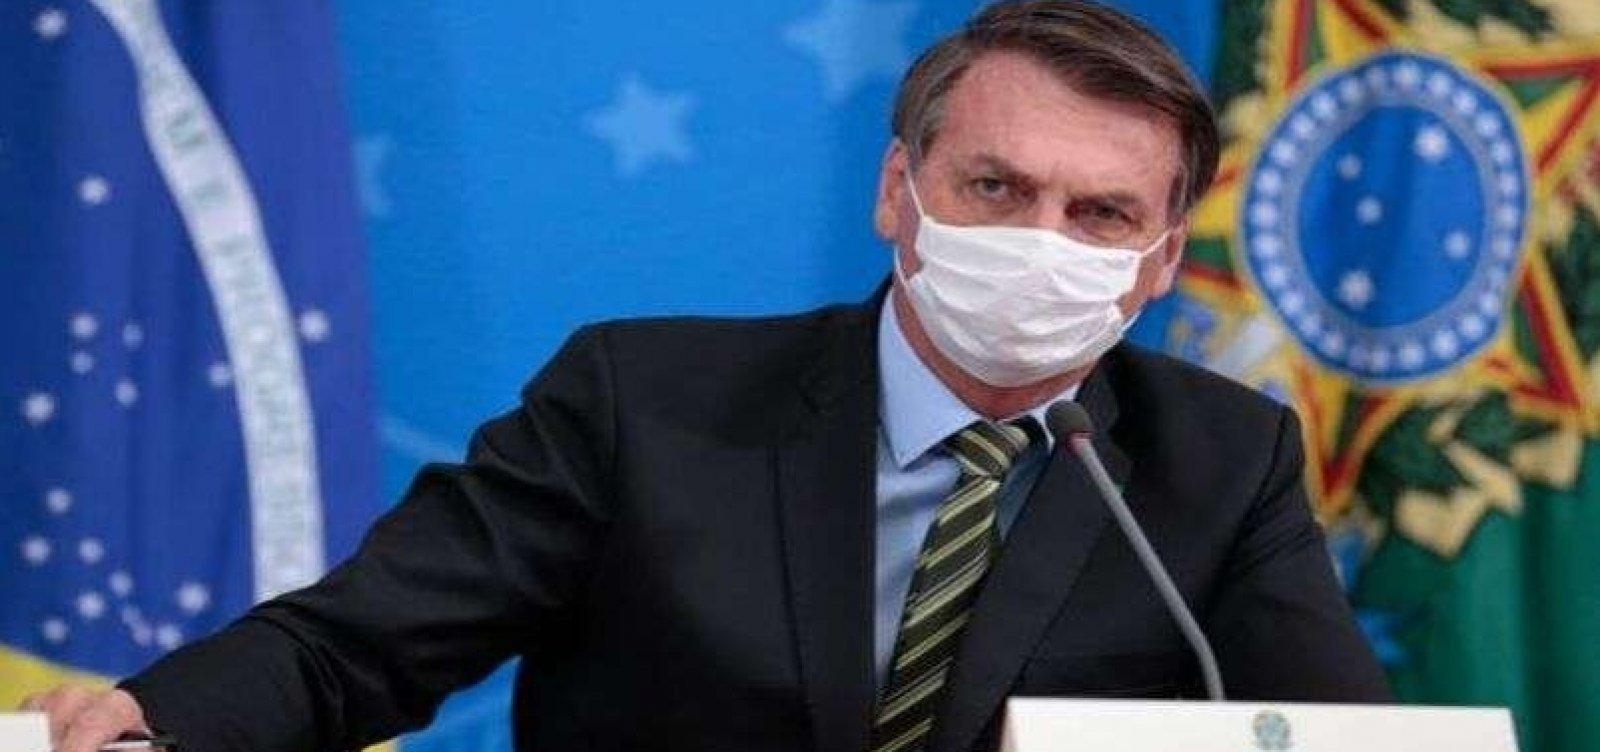 [Bolsonaro diz que pandemia 'pode ser fabricada']